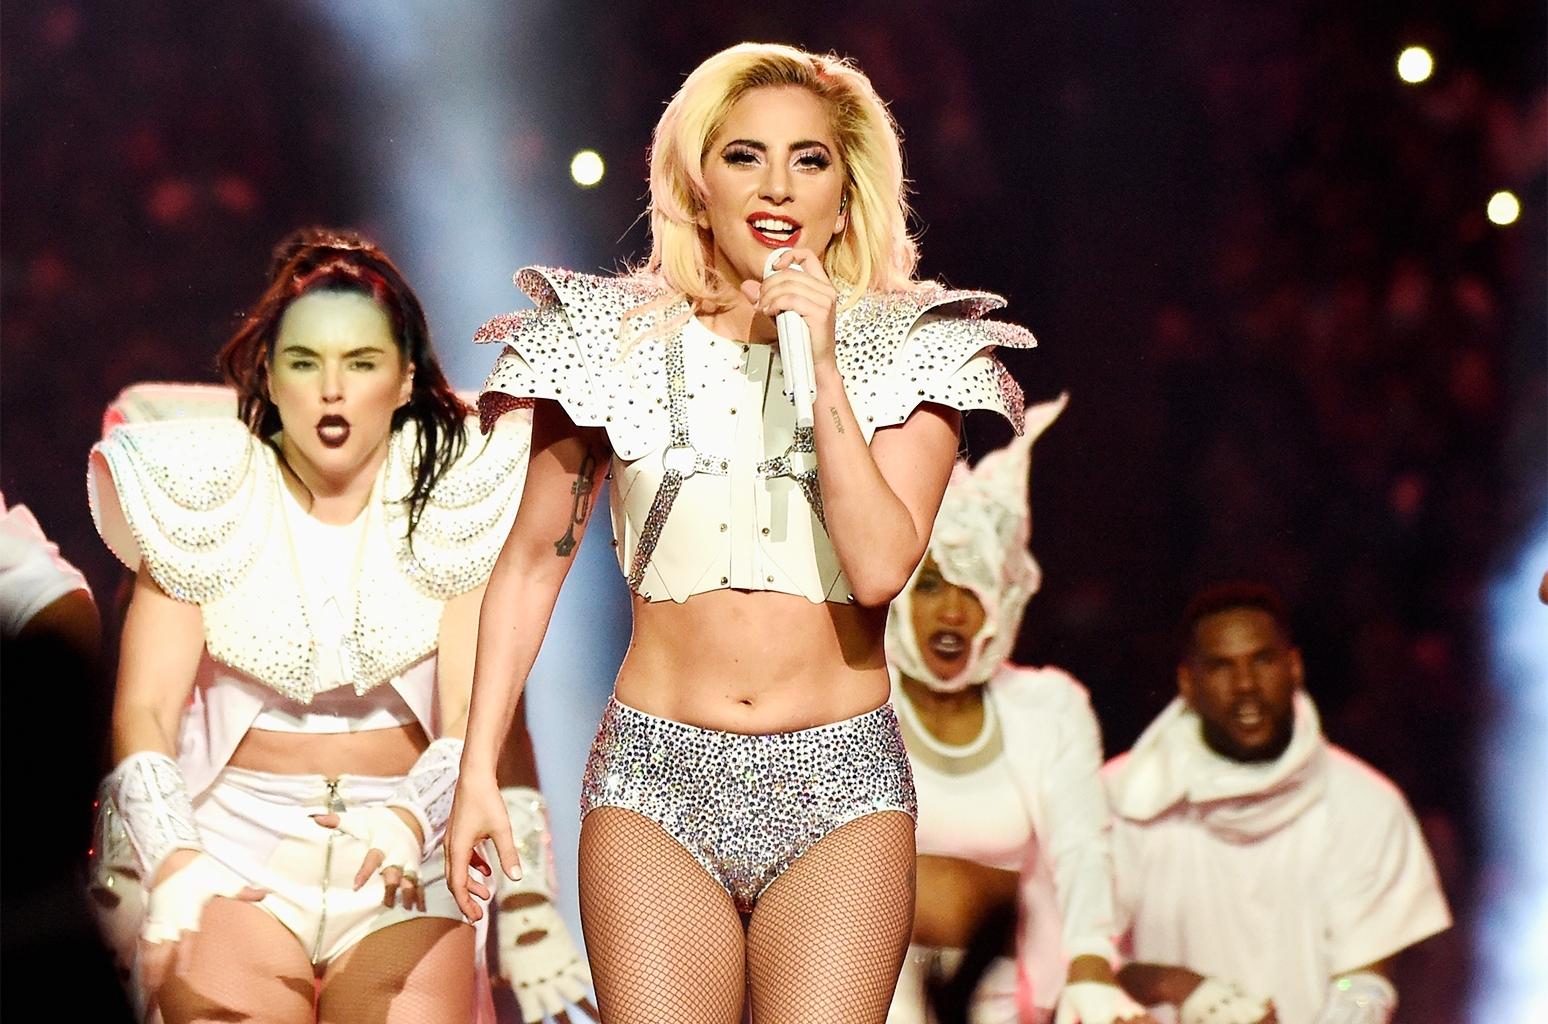 Lady Gaga's Super Bowl 2017 Halftime Show: She's A Legacy regarding Lady Gaga Super Bowl 2018